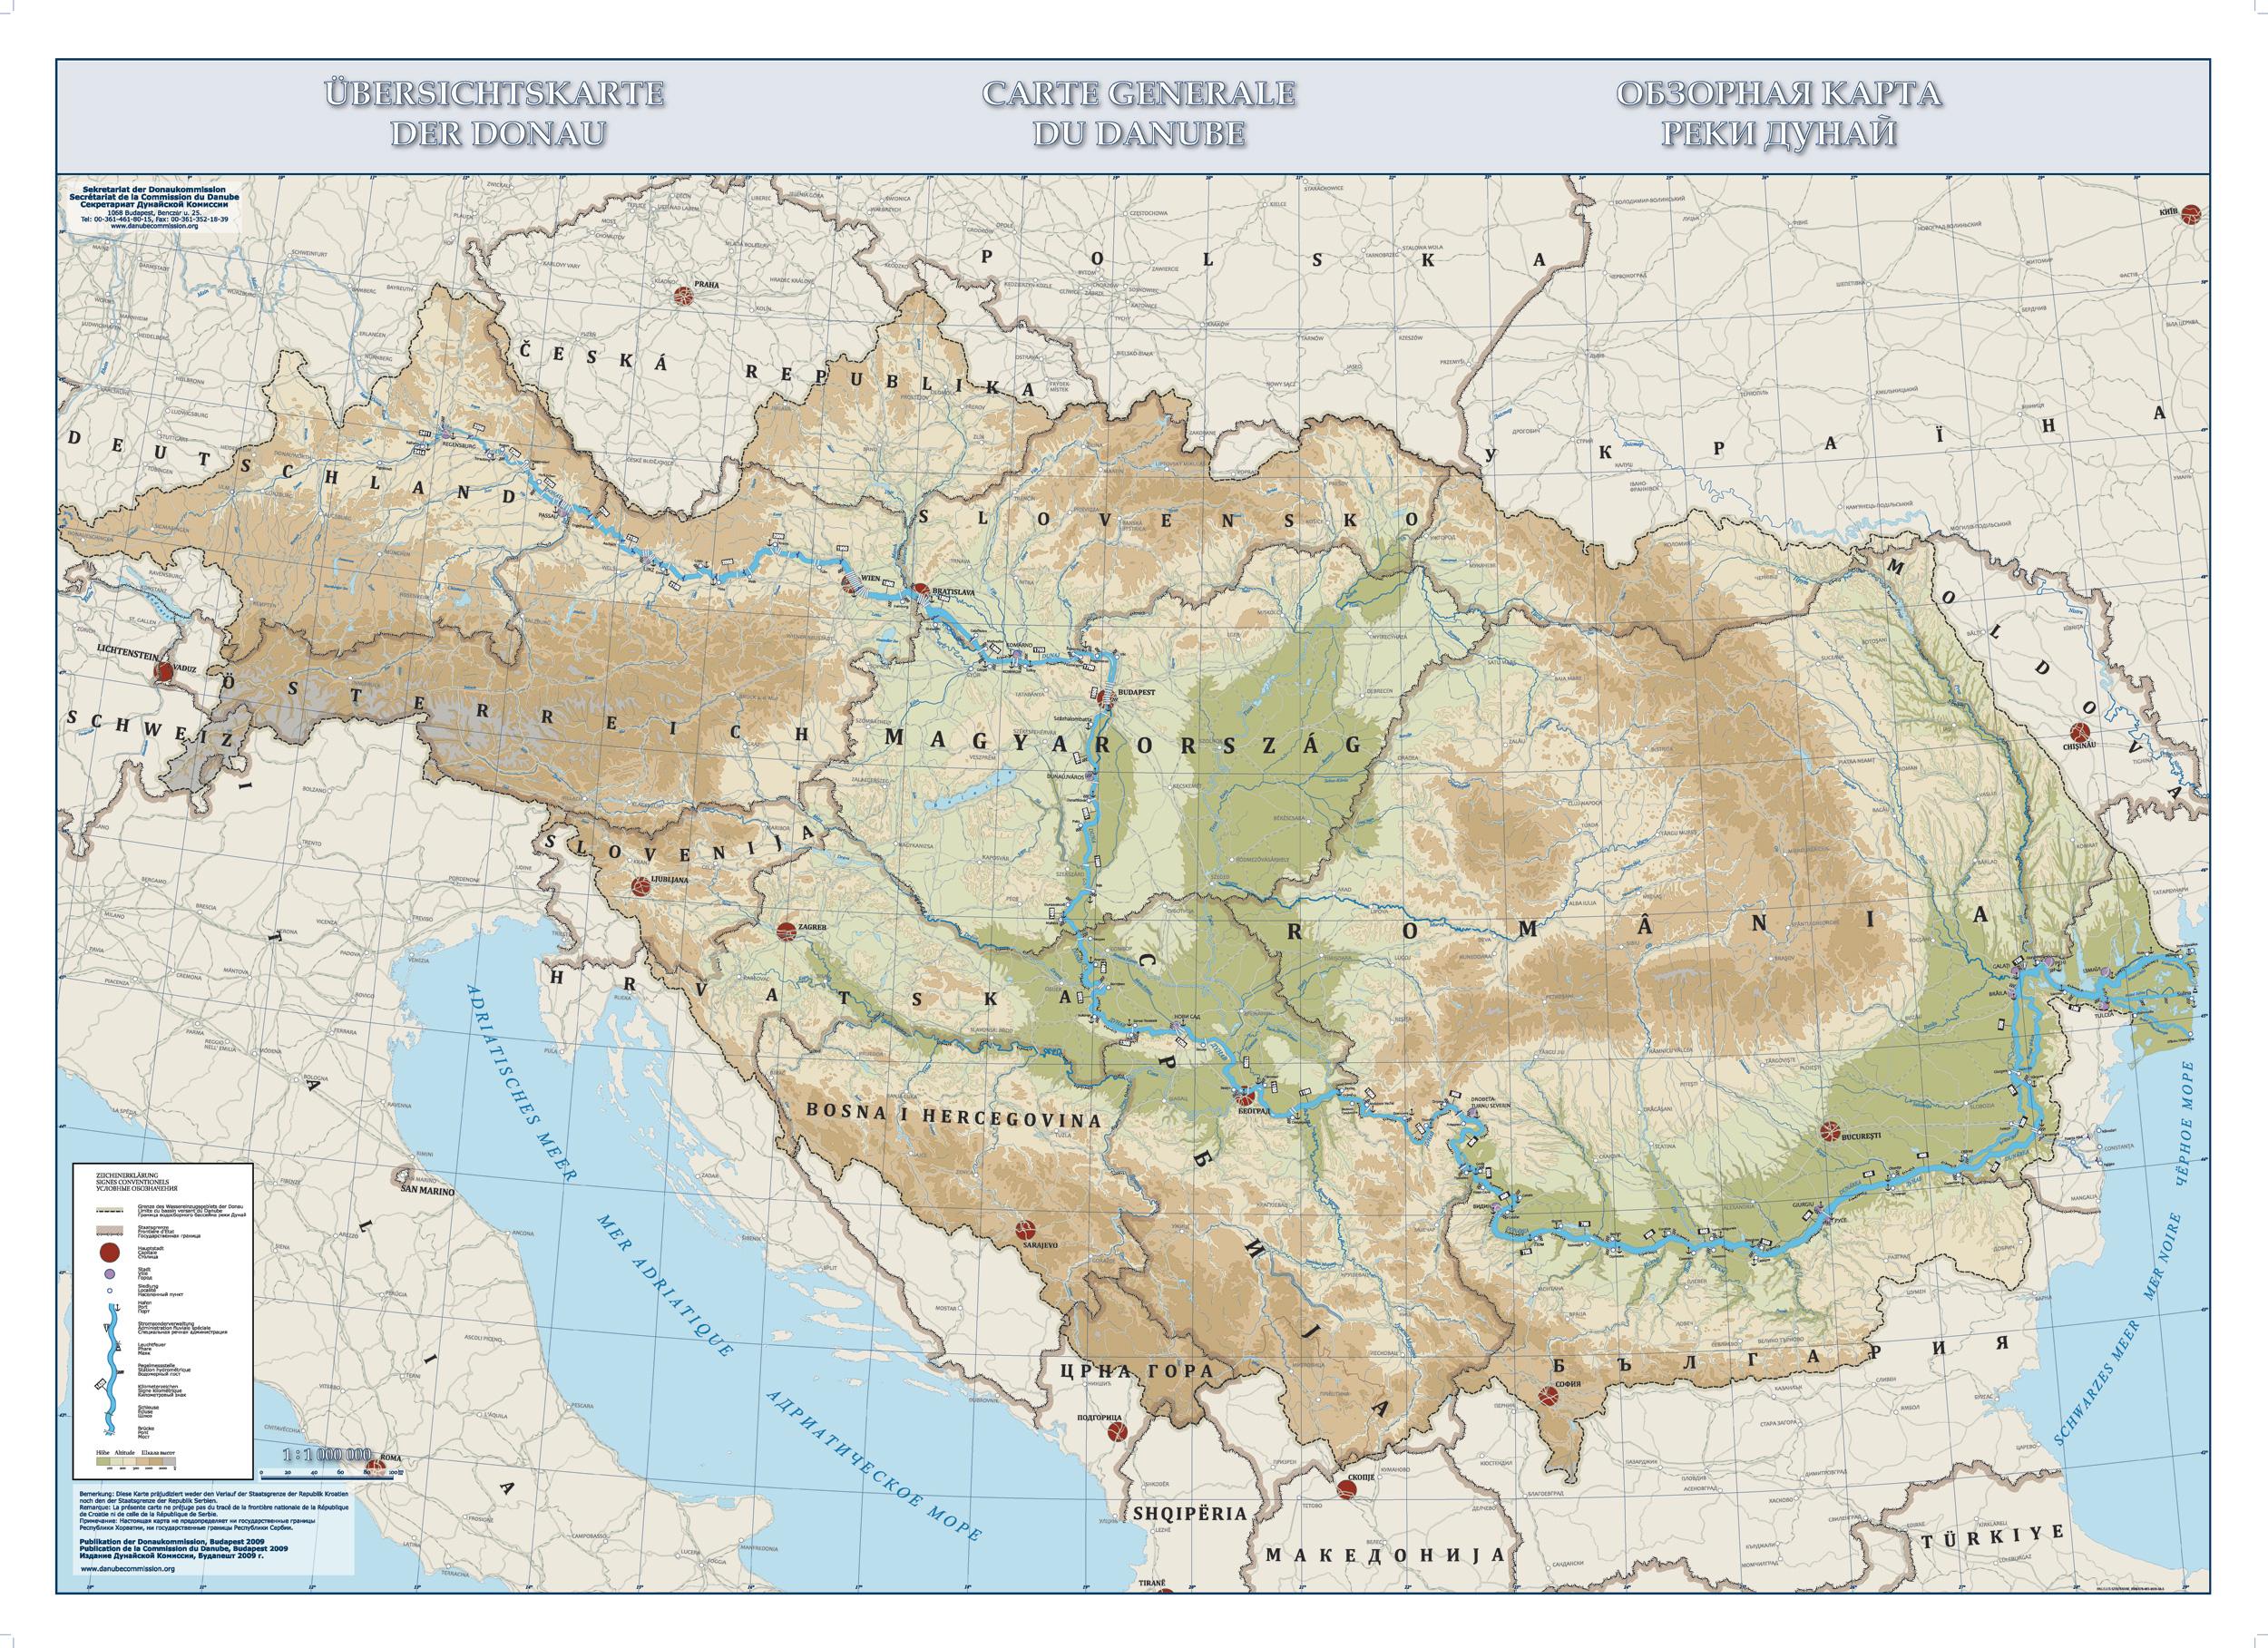 maps of the danube danube mission donaukommission